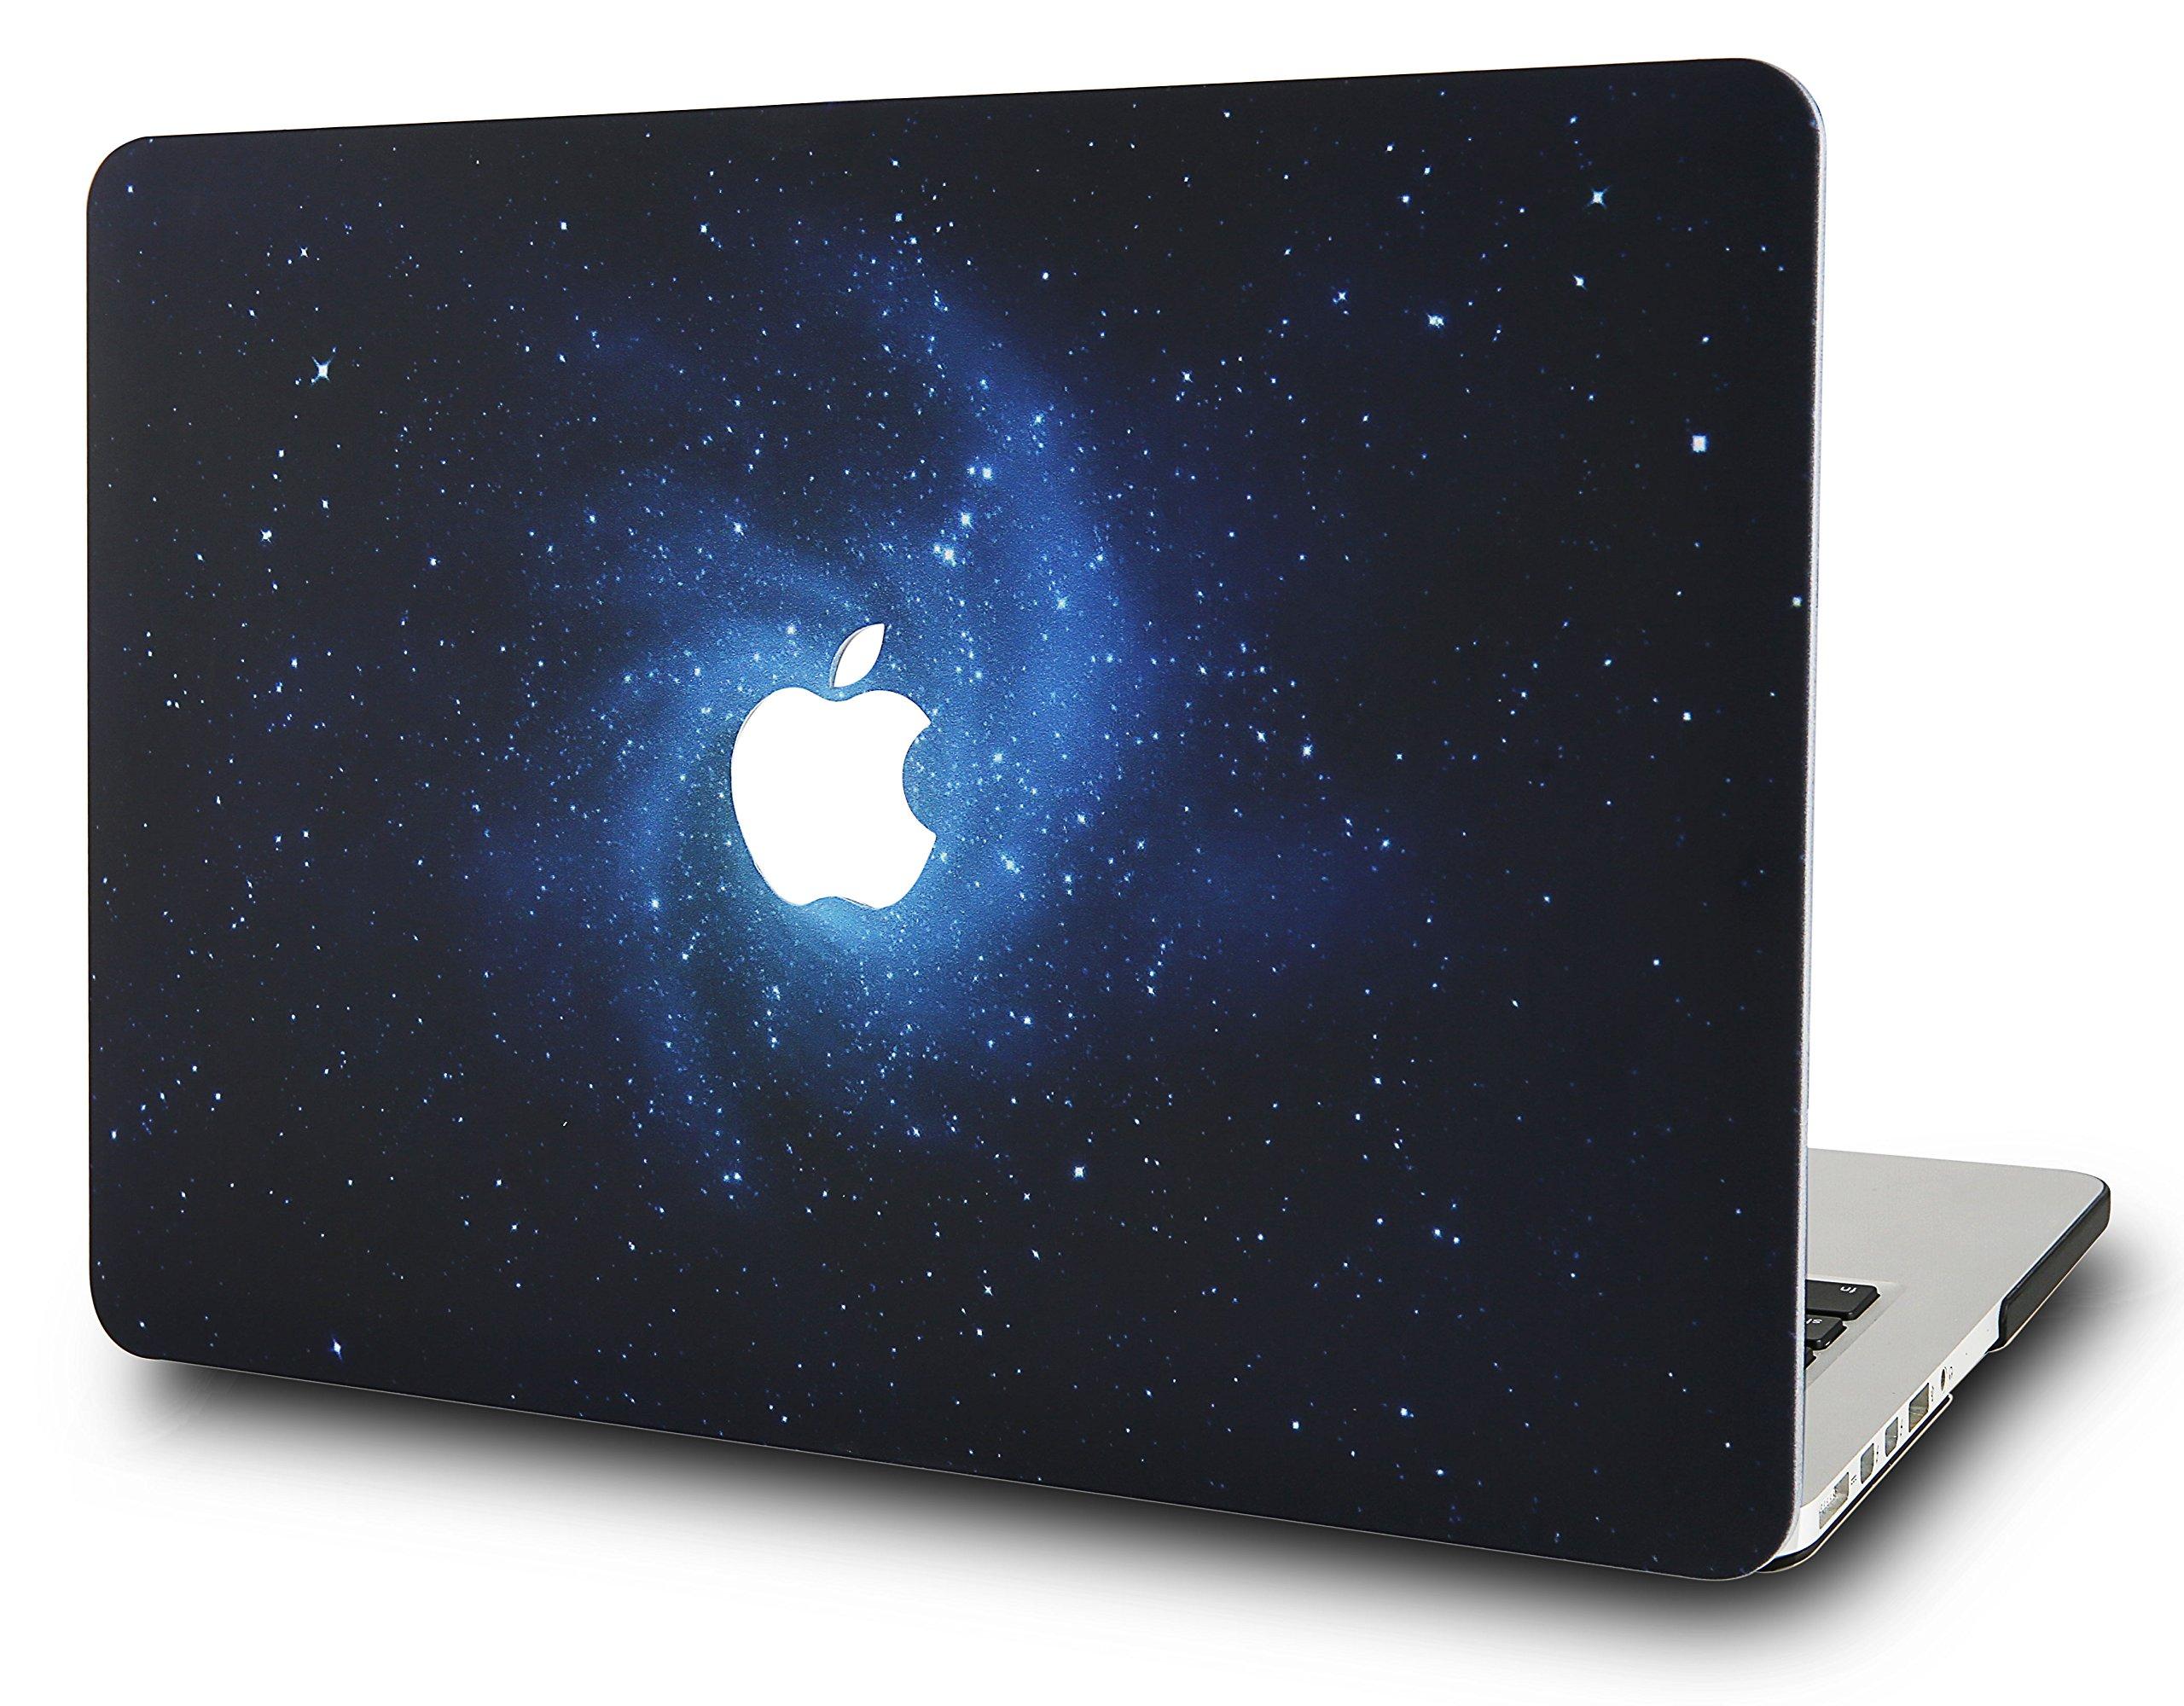 "KECC Laptop Case for MacBook Air 11"" Plastic Case Hard Shell Cover A1465 / A1370 (Blue)"